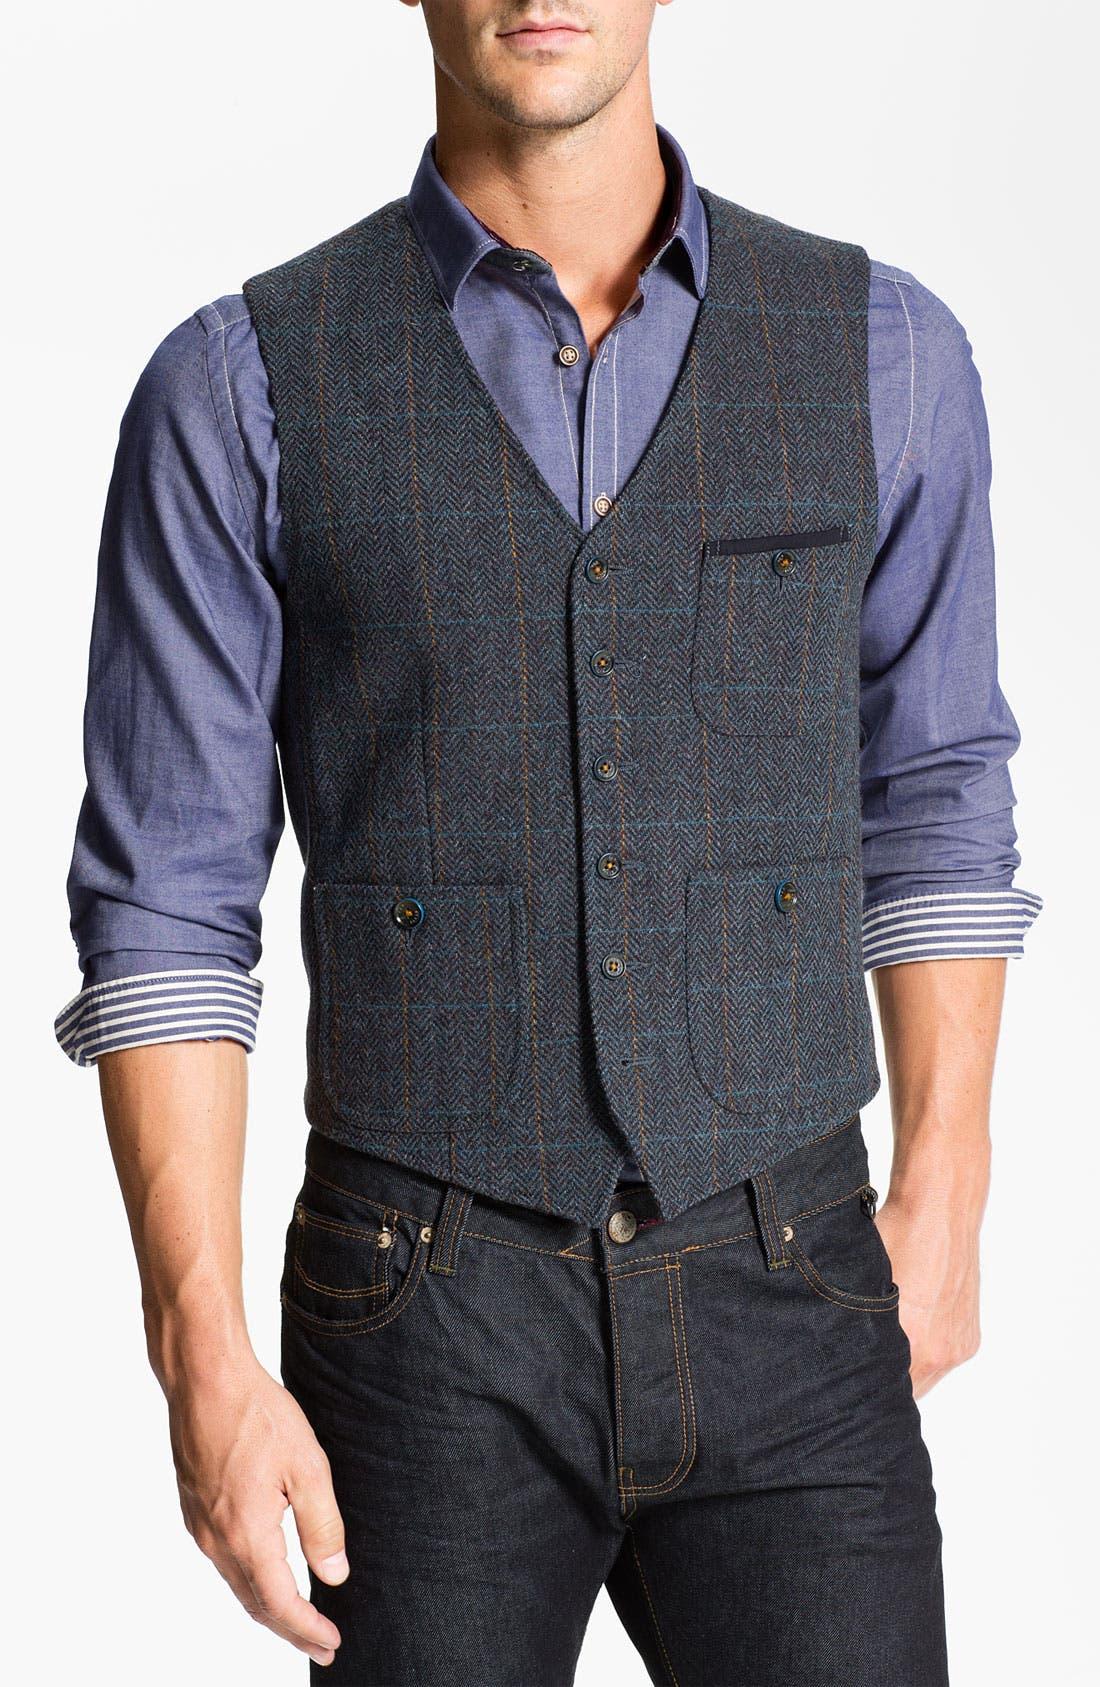 Main Image - Ted Baker London 'Rythwai' Wool Waistcoat